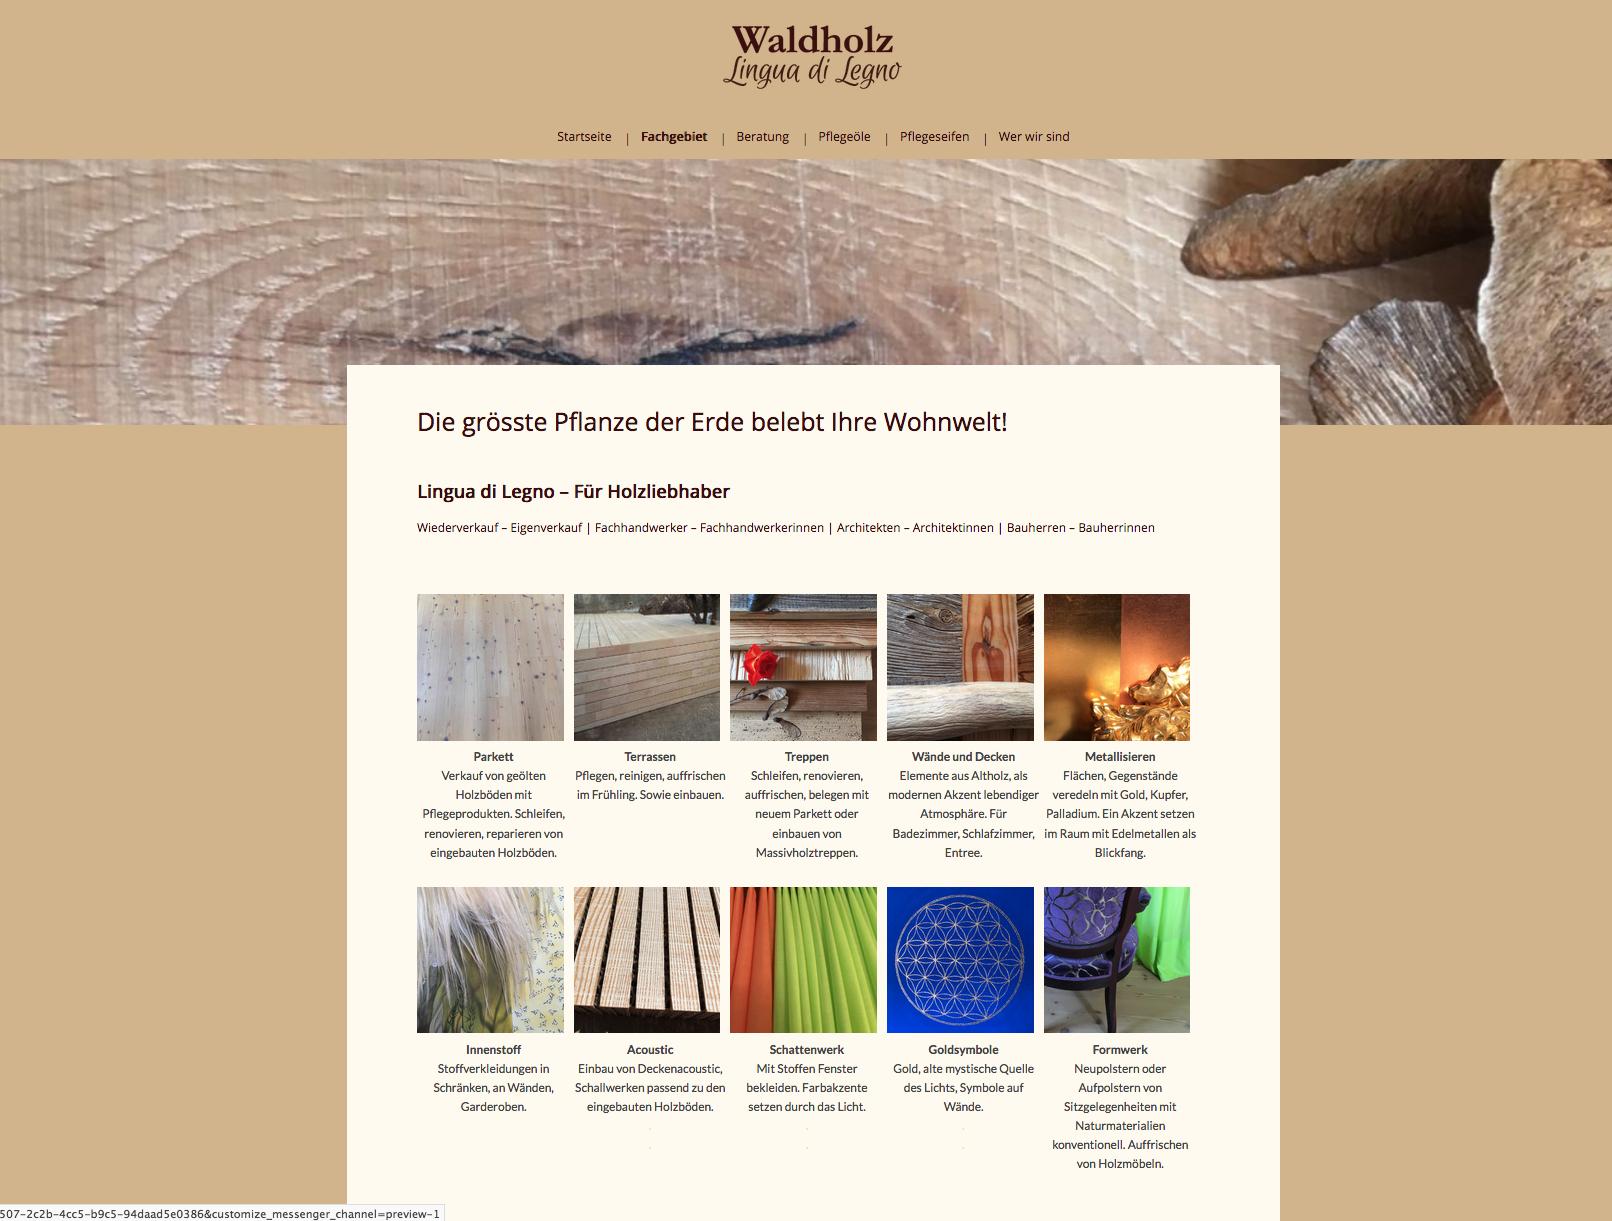 Waldholz – Marianne Aeschbach